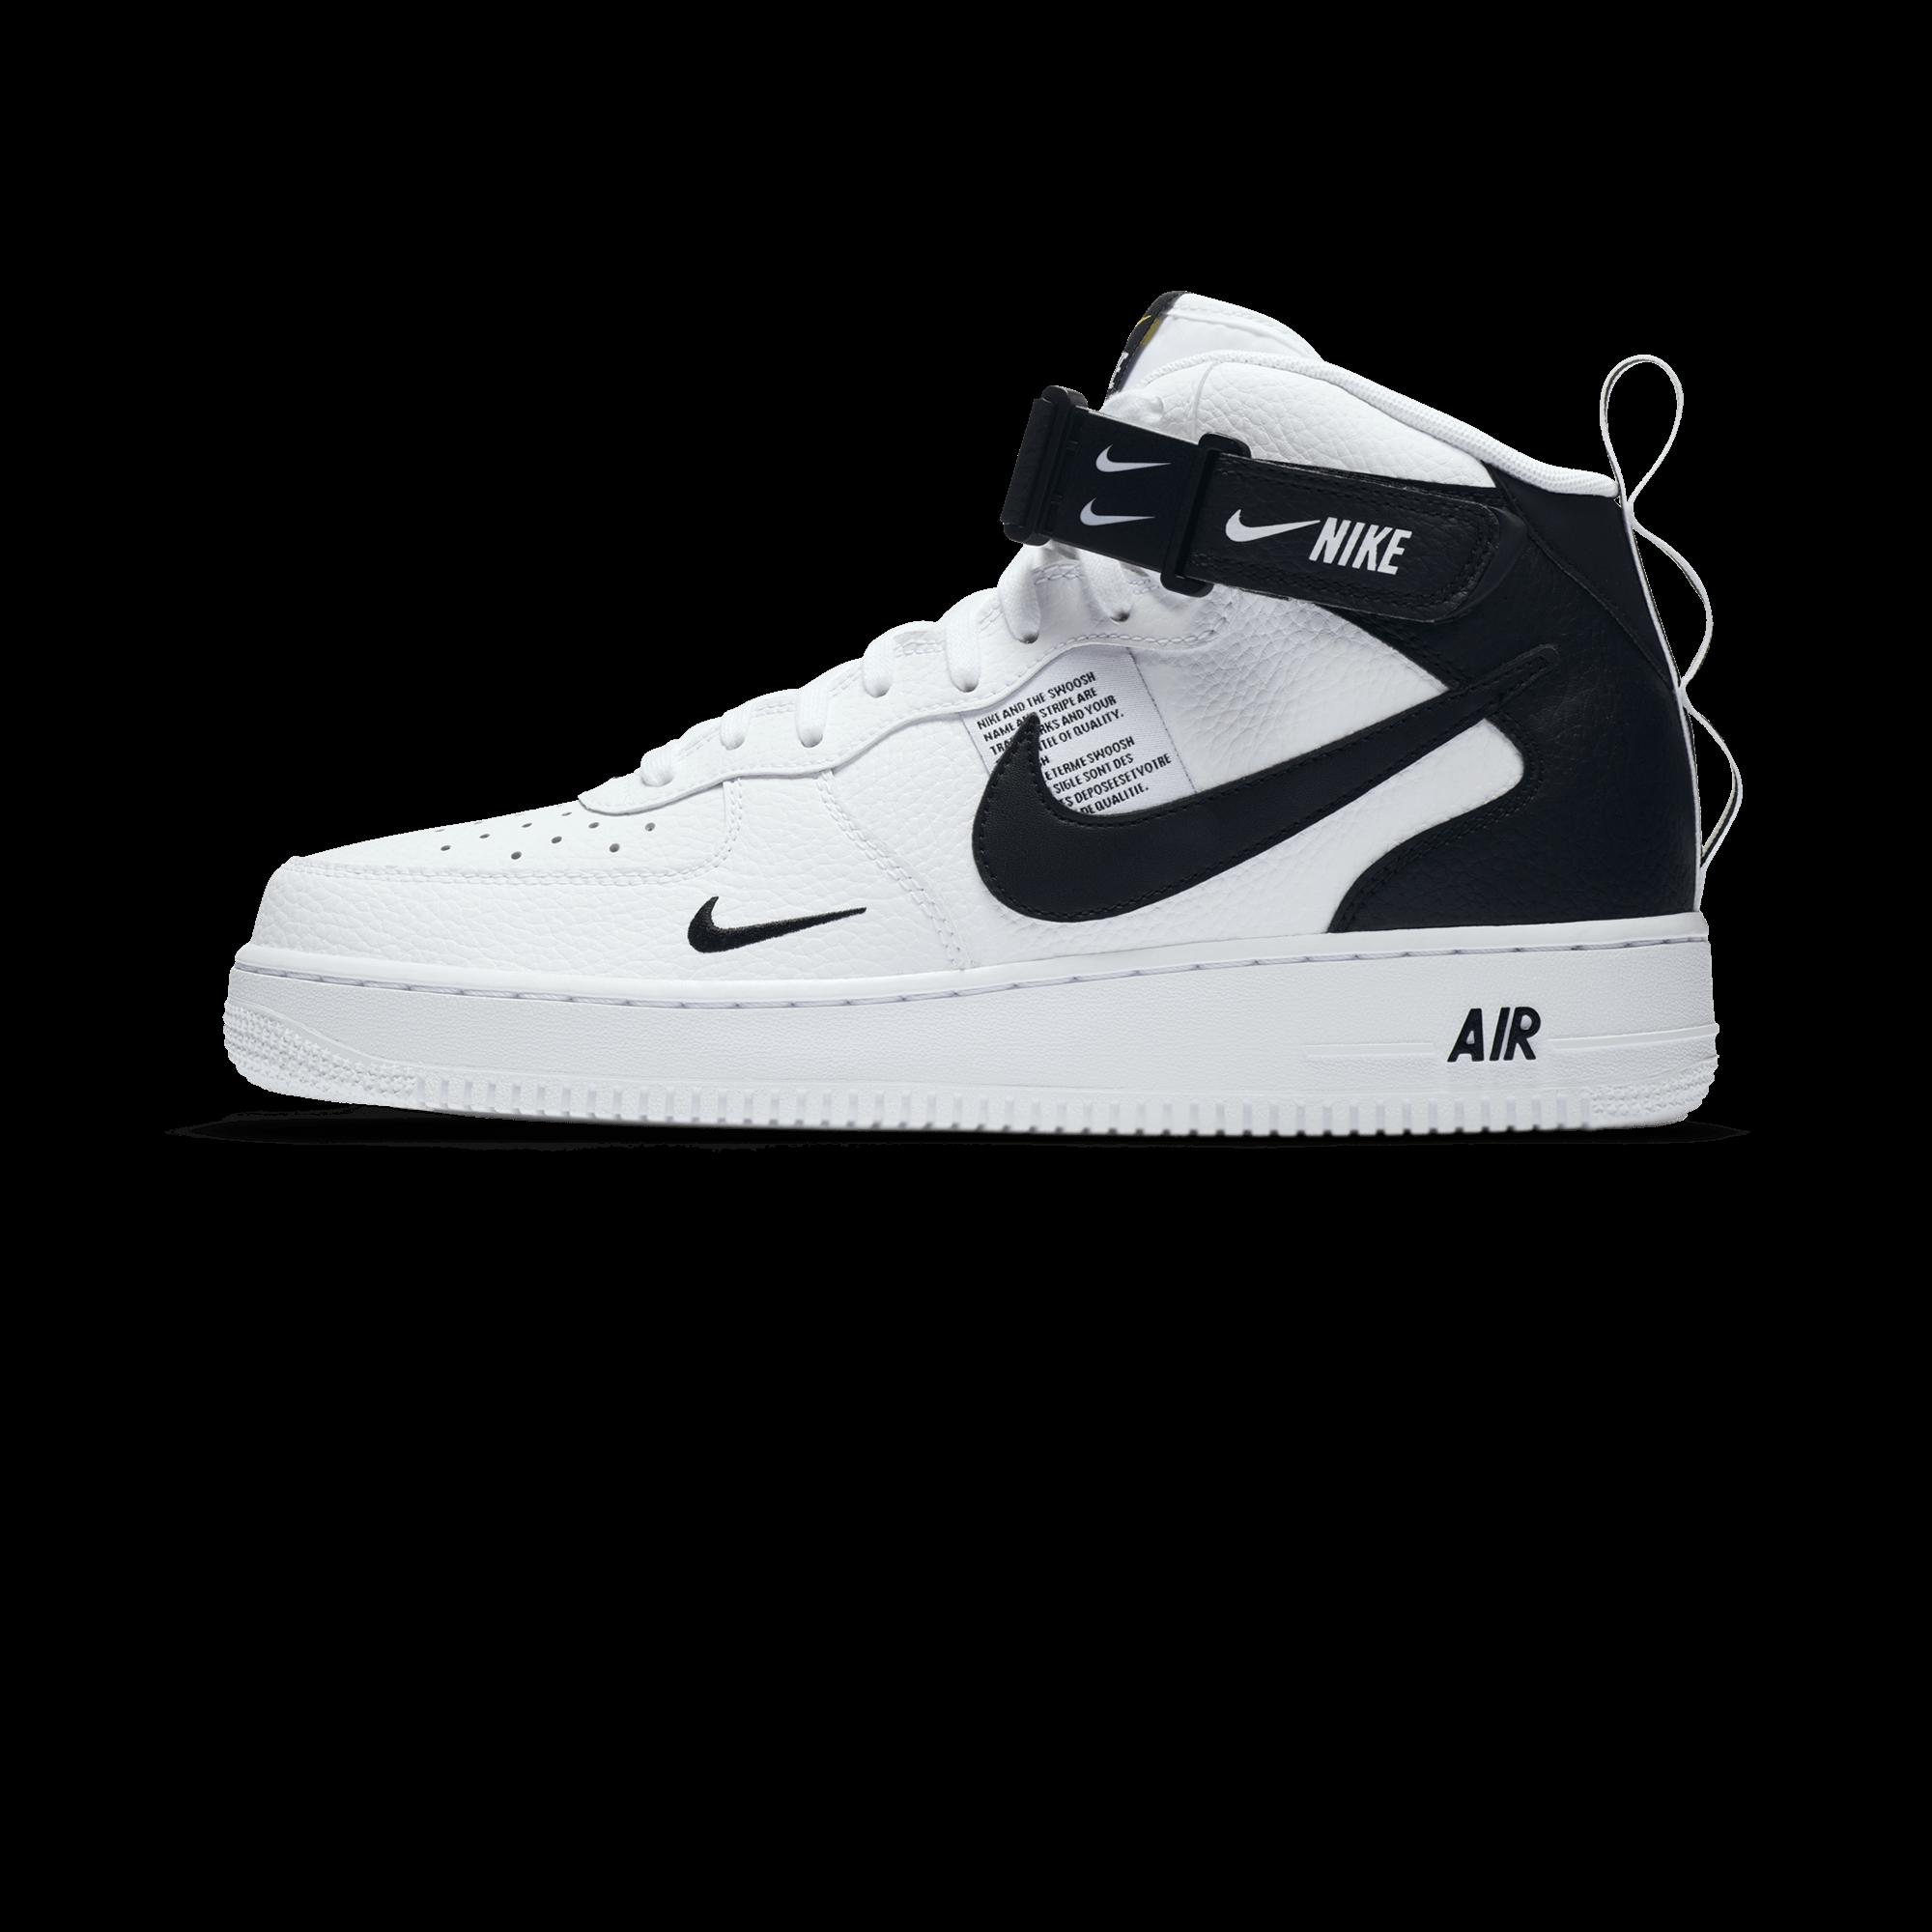 Nike Air Force 1 Mid '07 White Uomo